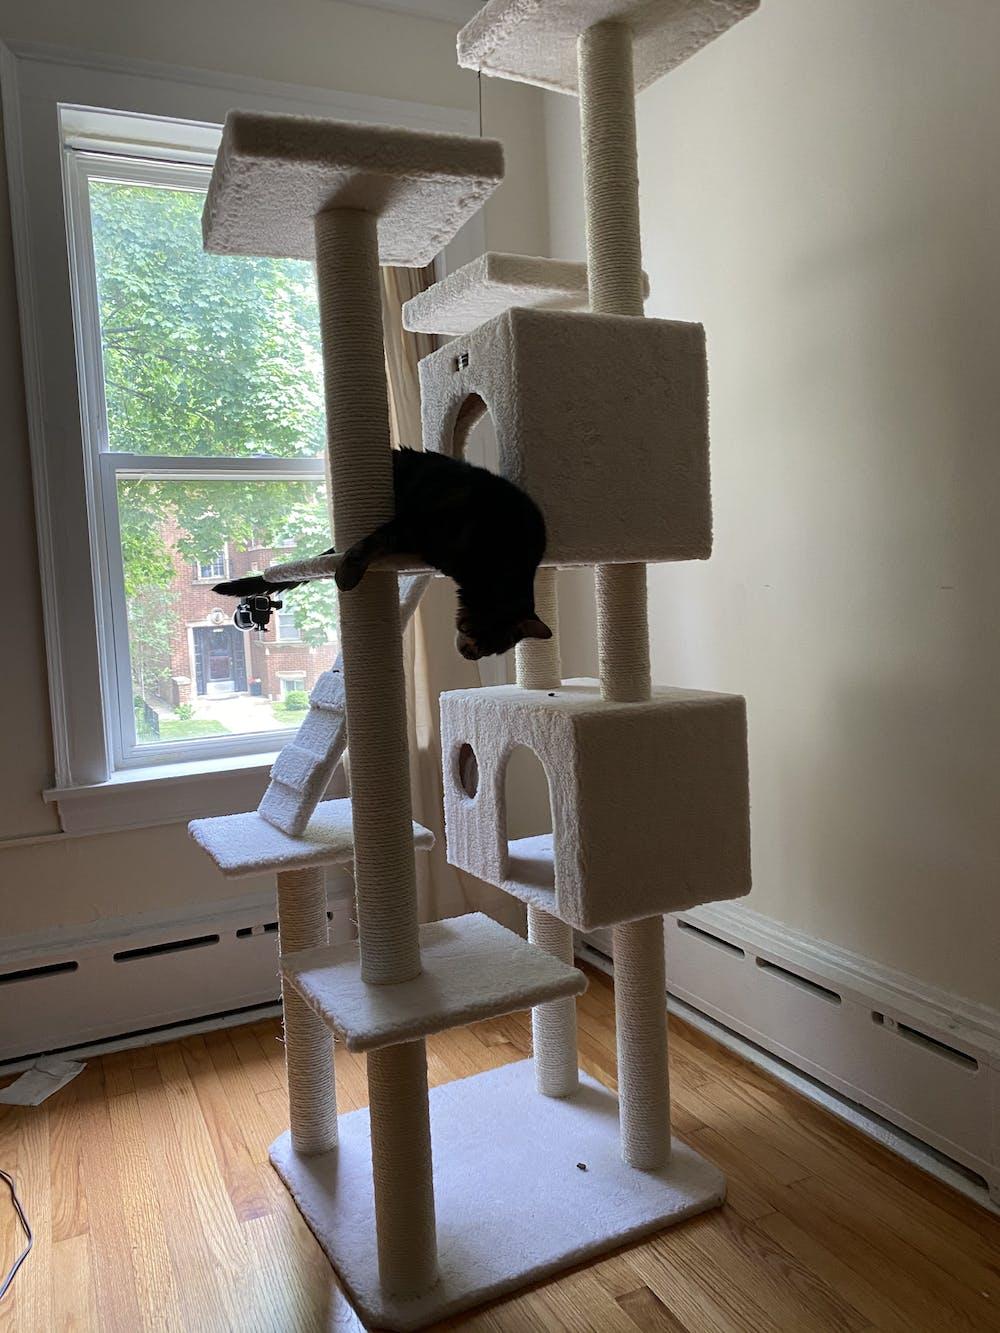 Armarkat Classic 77-Inch Cat Tree Model, Ivory (B7701)